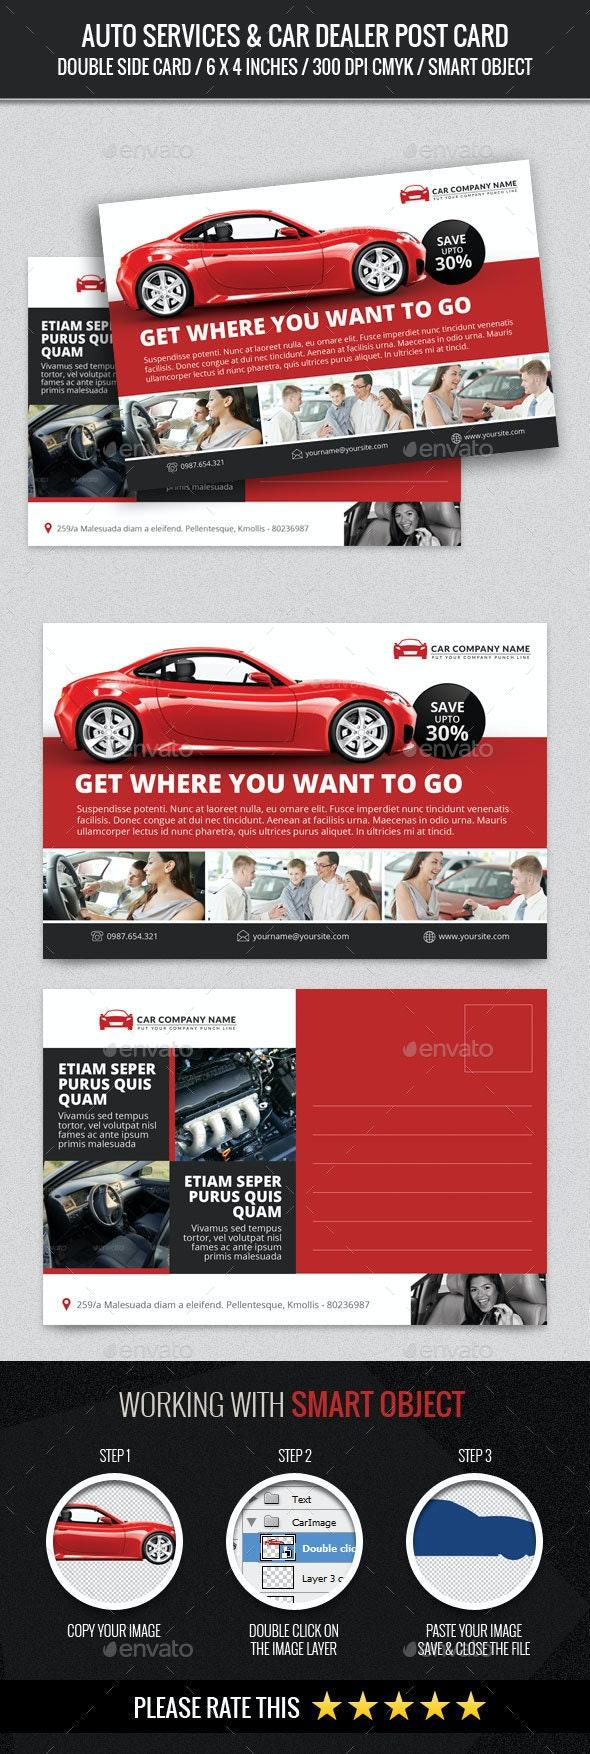 Auto Services & Car Dealer Post Card - Cards & Invites Print Templates